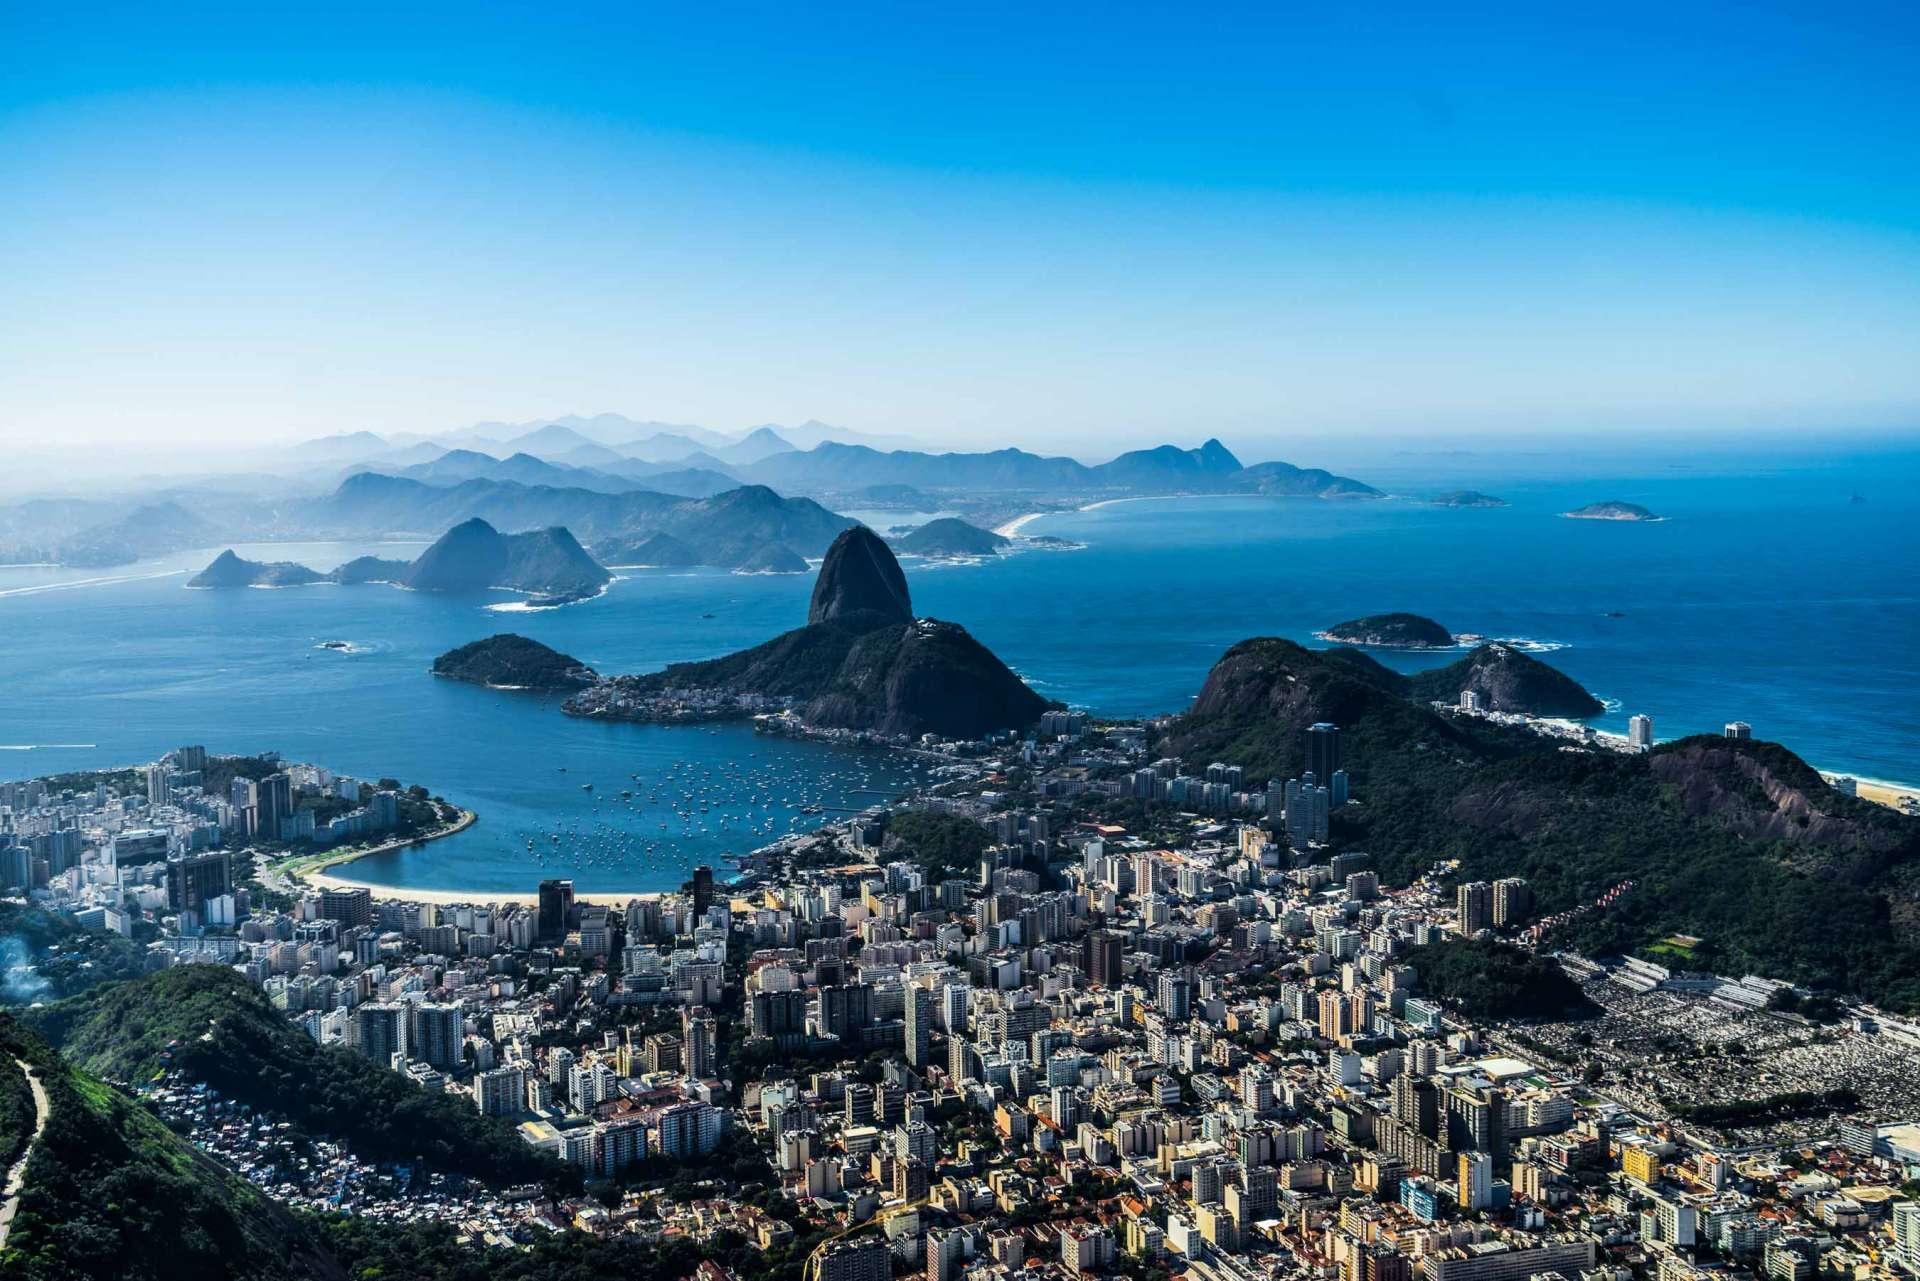 Rio de Janeiro Pescart Enrico Pescantini Christ the Redeemer view